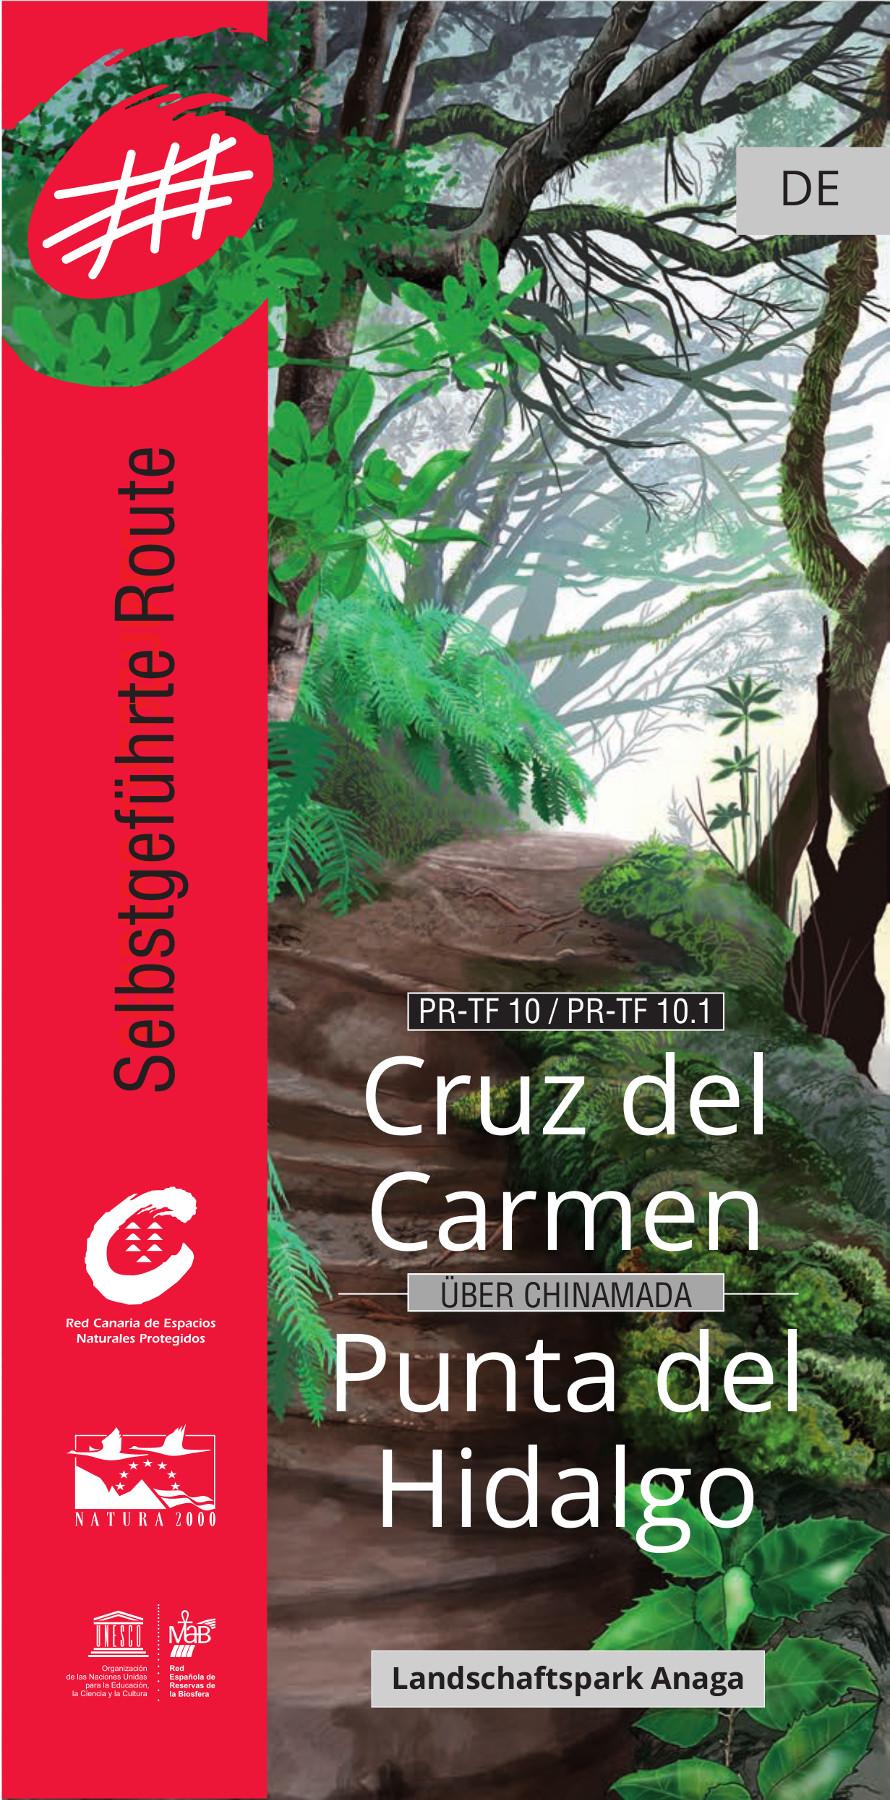 Ruta Autoguiada Cruz del Carmen - Punta del Hidalgo / Alemán